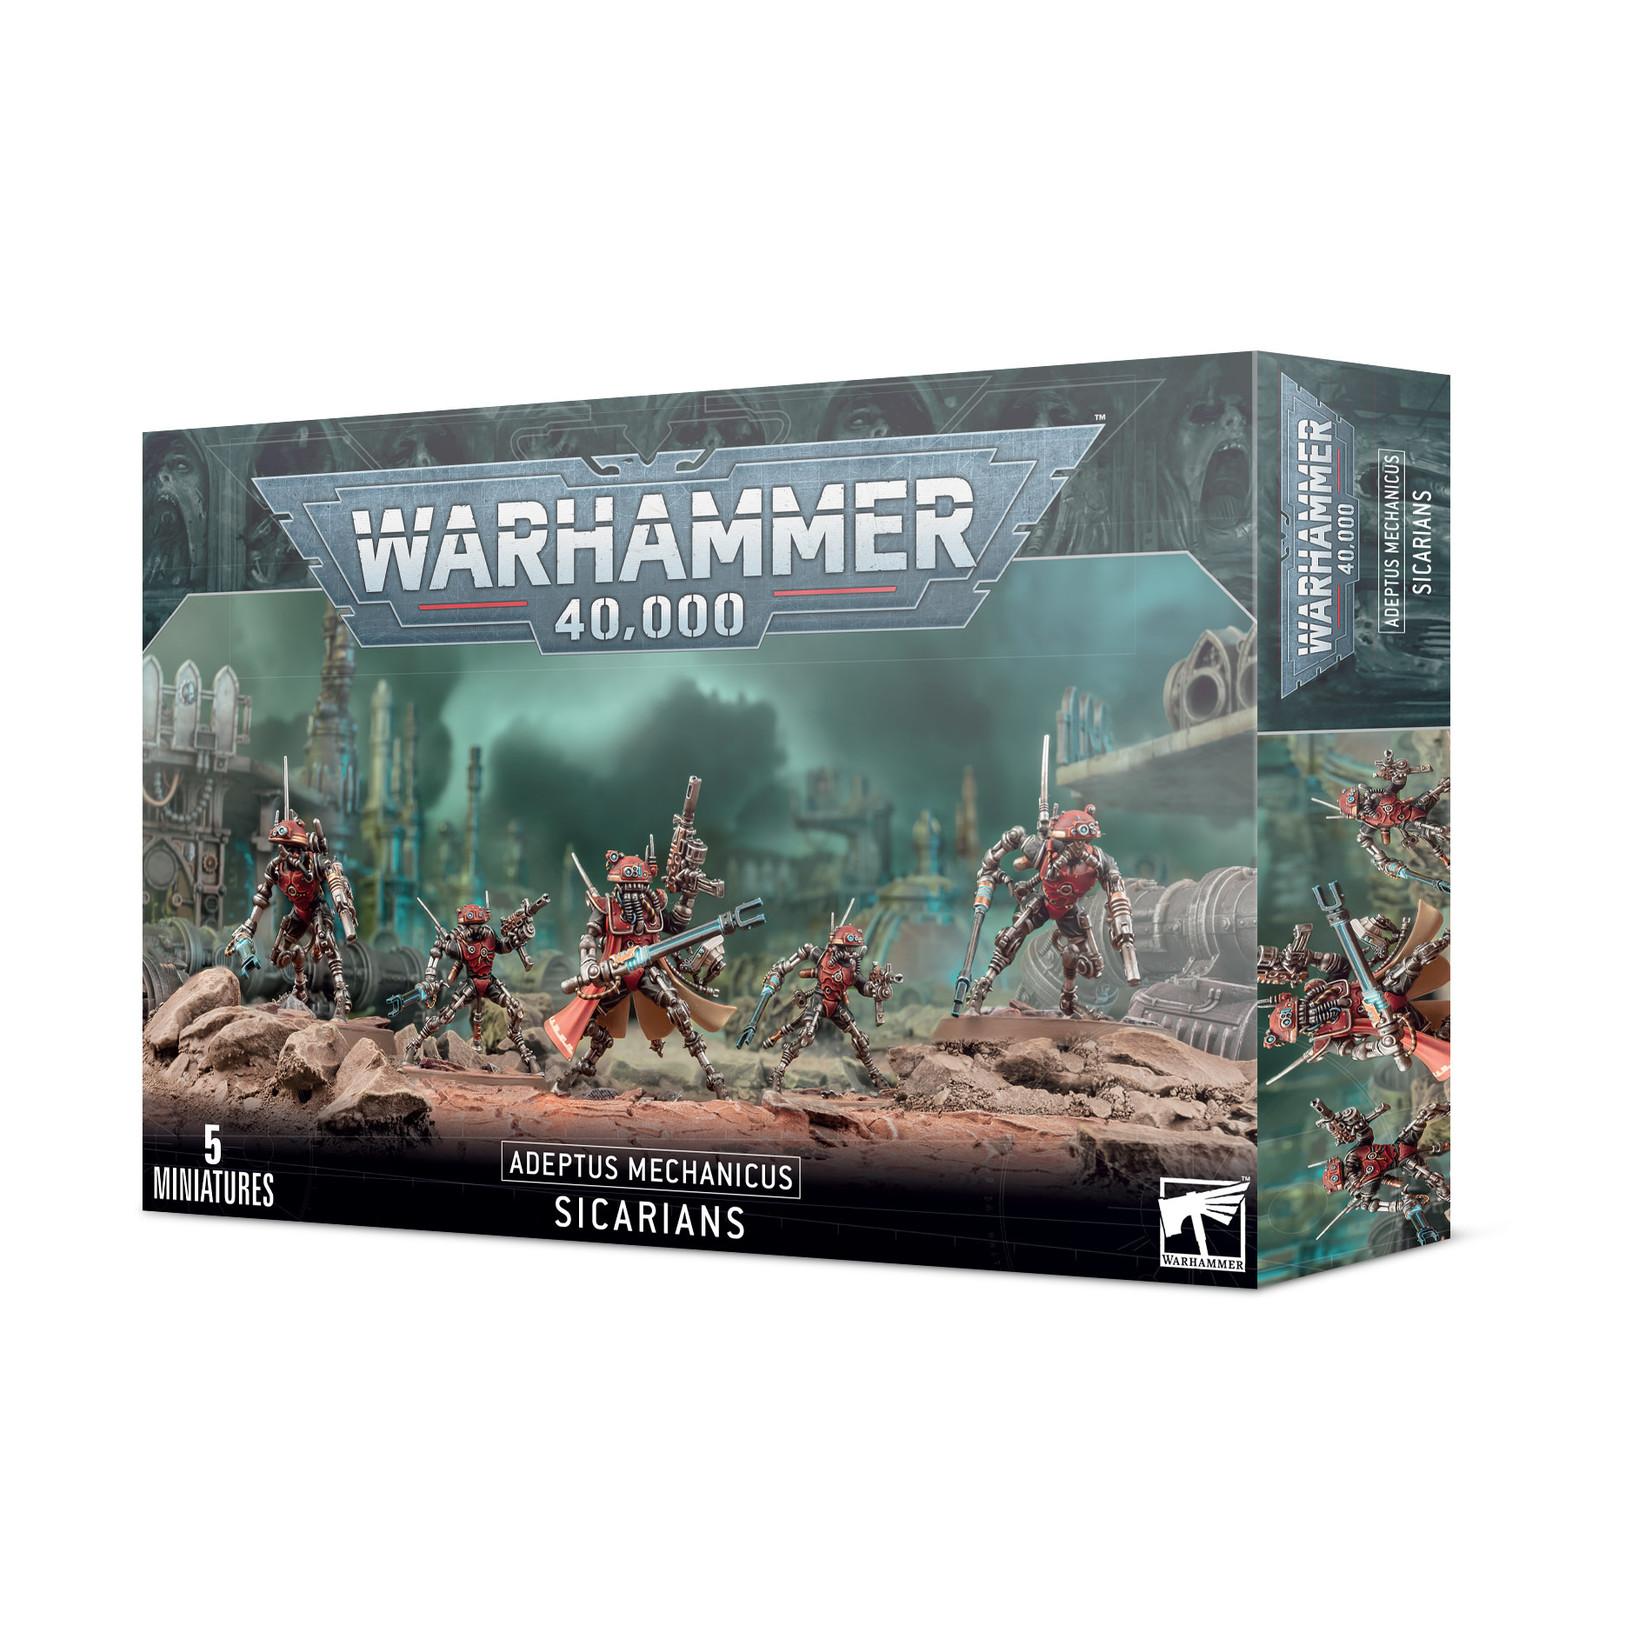 Games Workshop Warhammer 40k: Adeptus Mechanicus - Sicarians